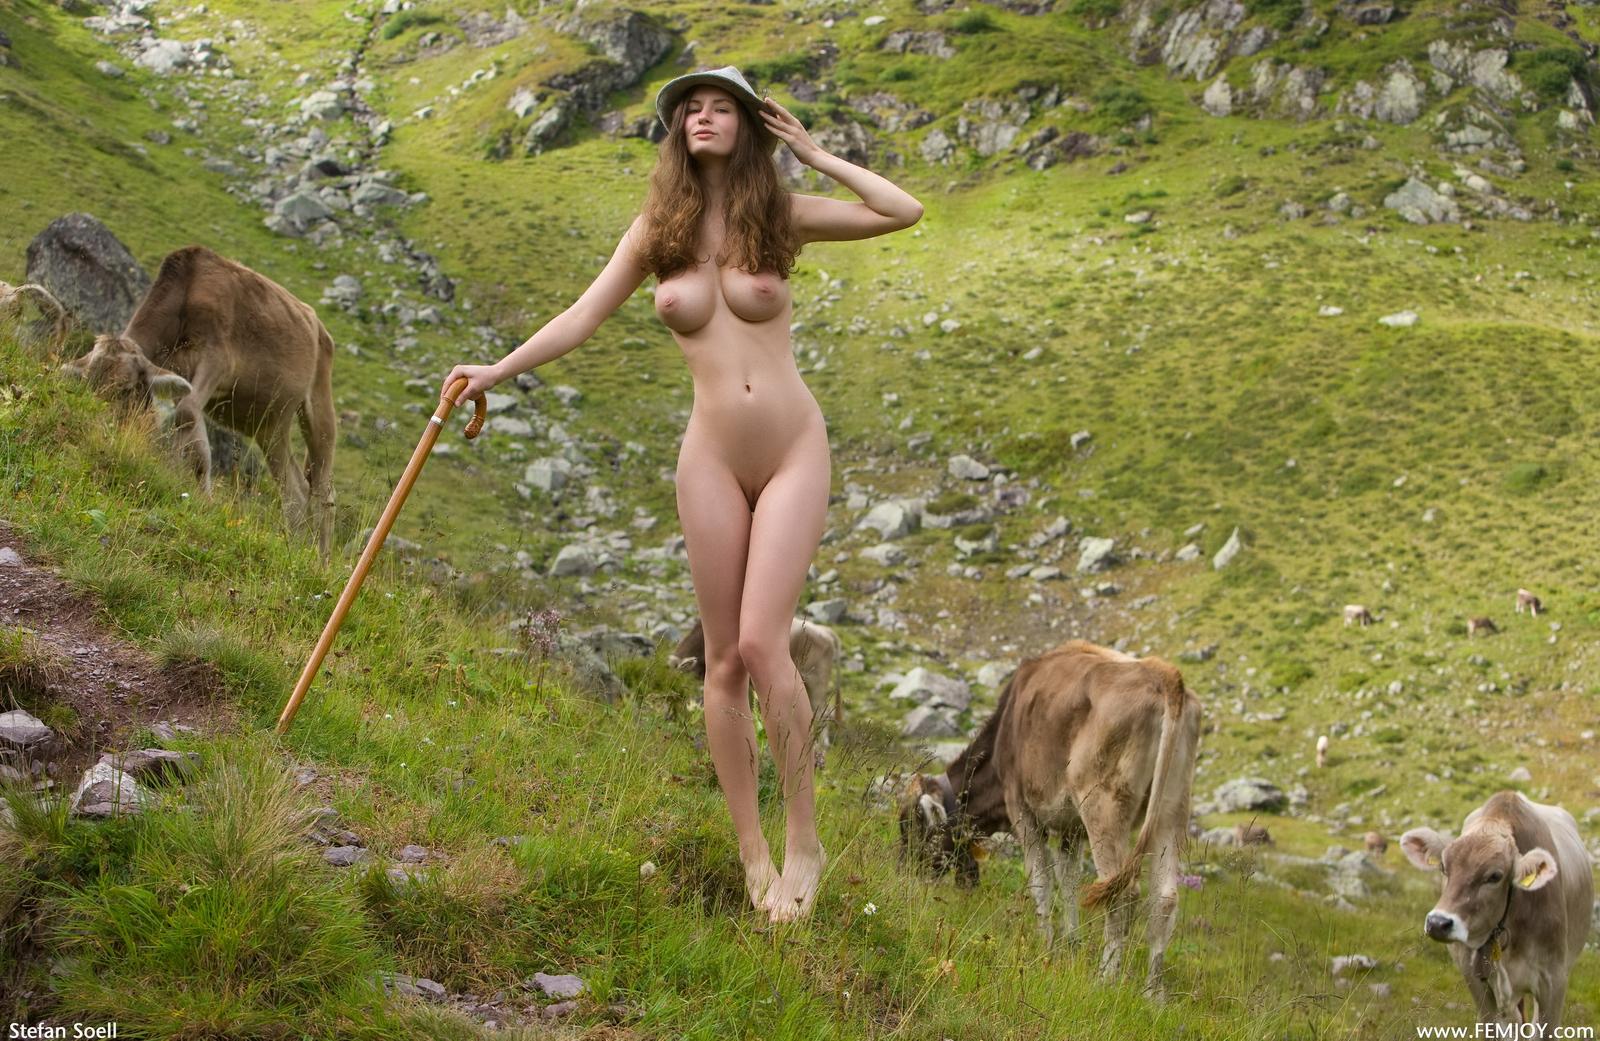 susann-tits-cowgirl-hat-shepherd-naked-femjoy-03